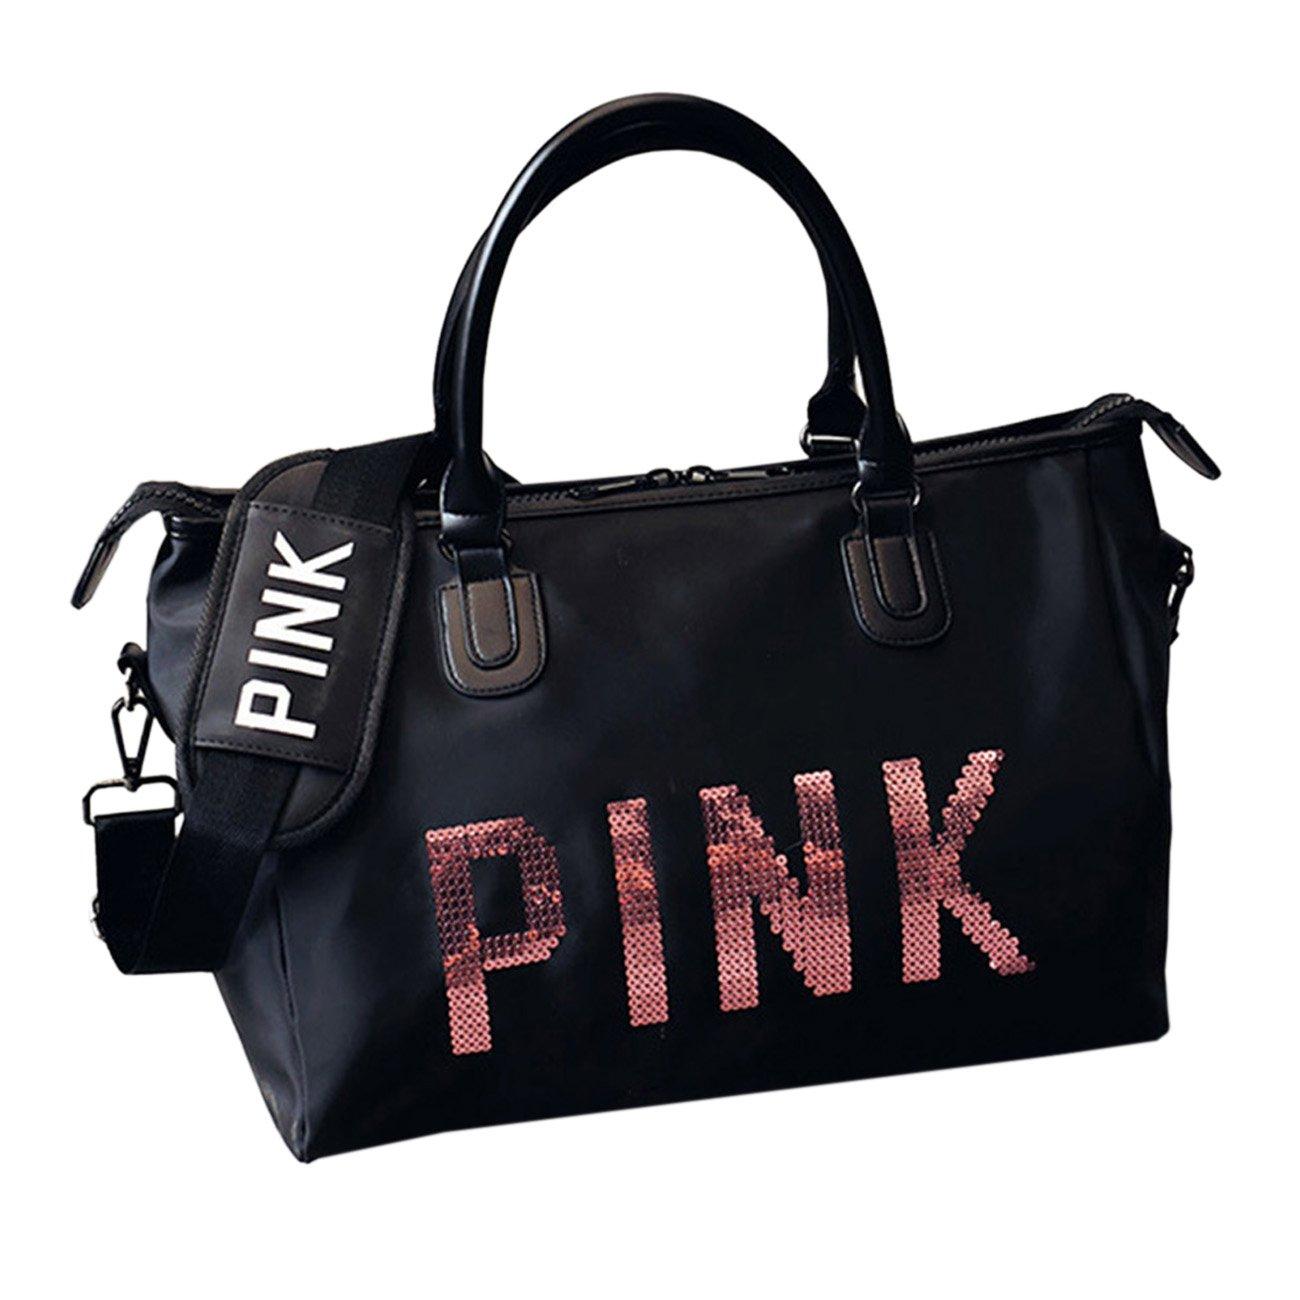 THEE High Capacity Waterproof Sports Bag Travel Tote Bag PFFPBB646-S